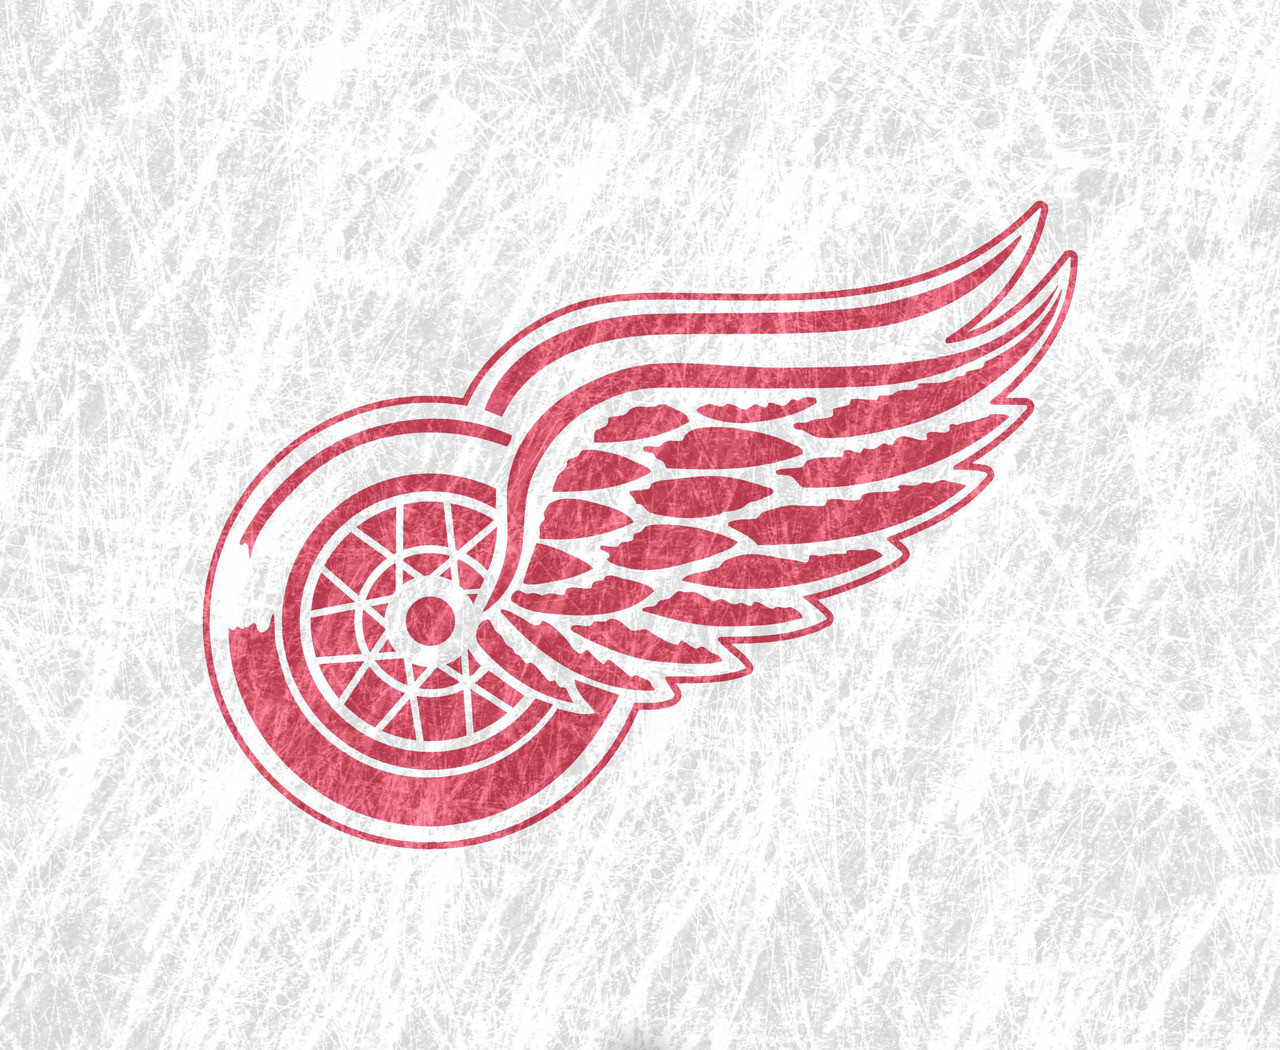 Detroit Red Wings Logo Wallpaper 1280x1050